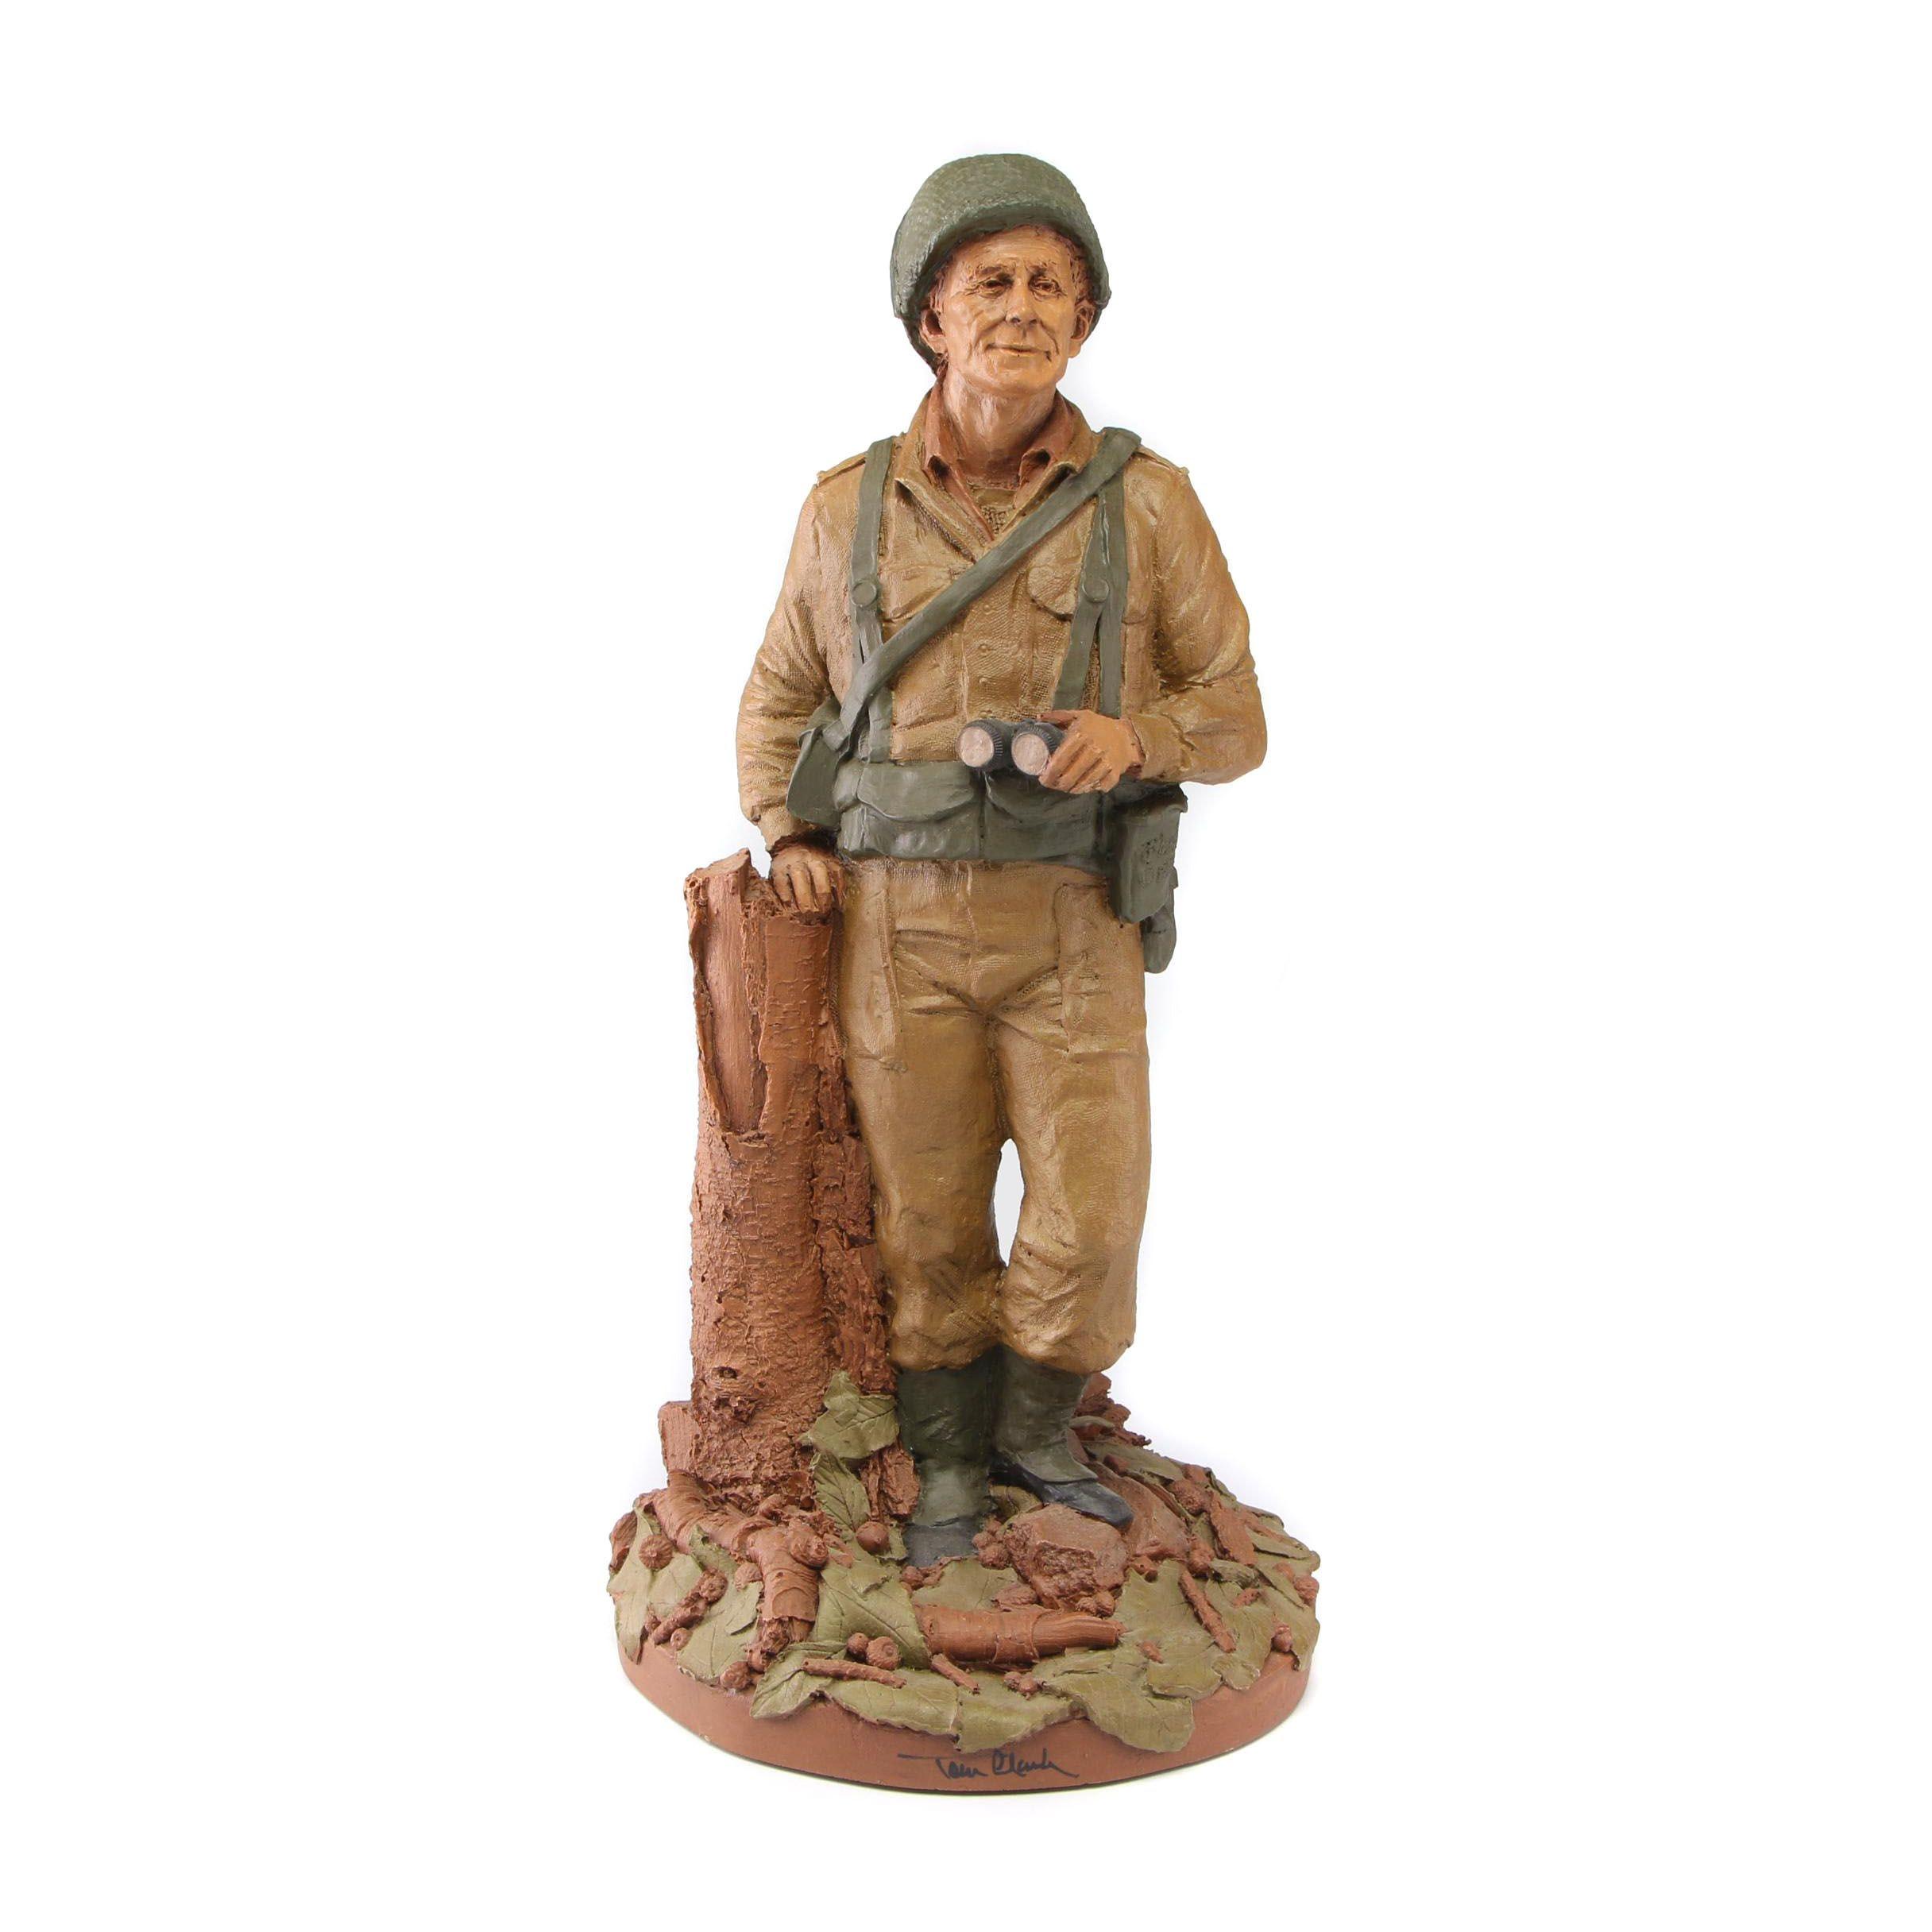 Tom Clark WWII Soldier Figurine